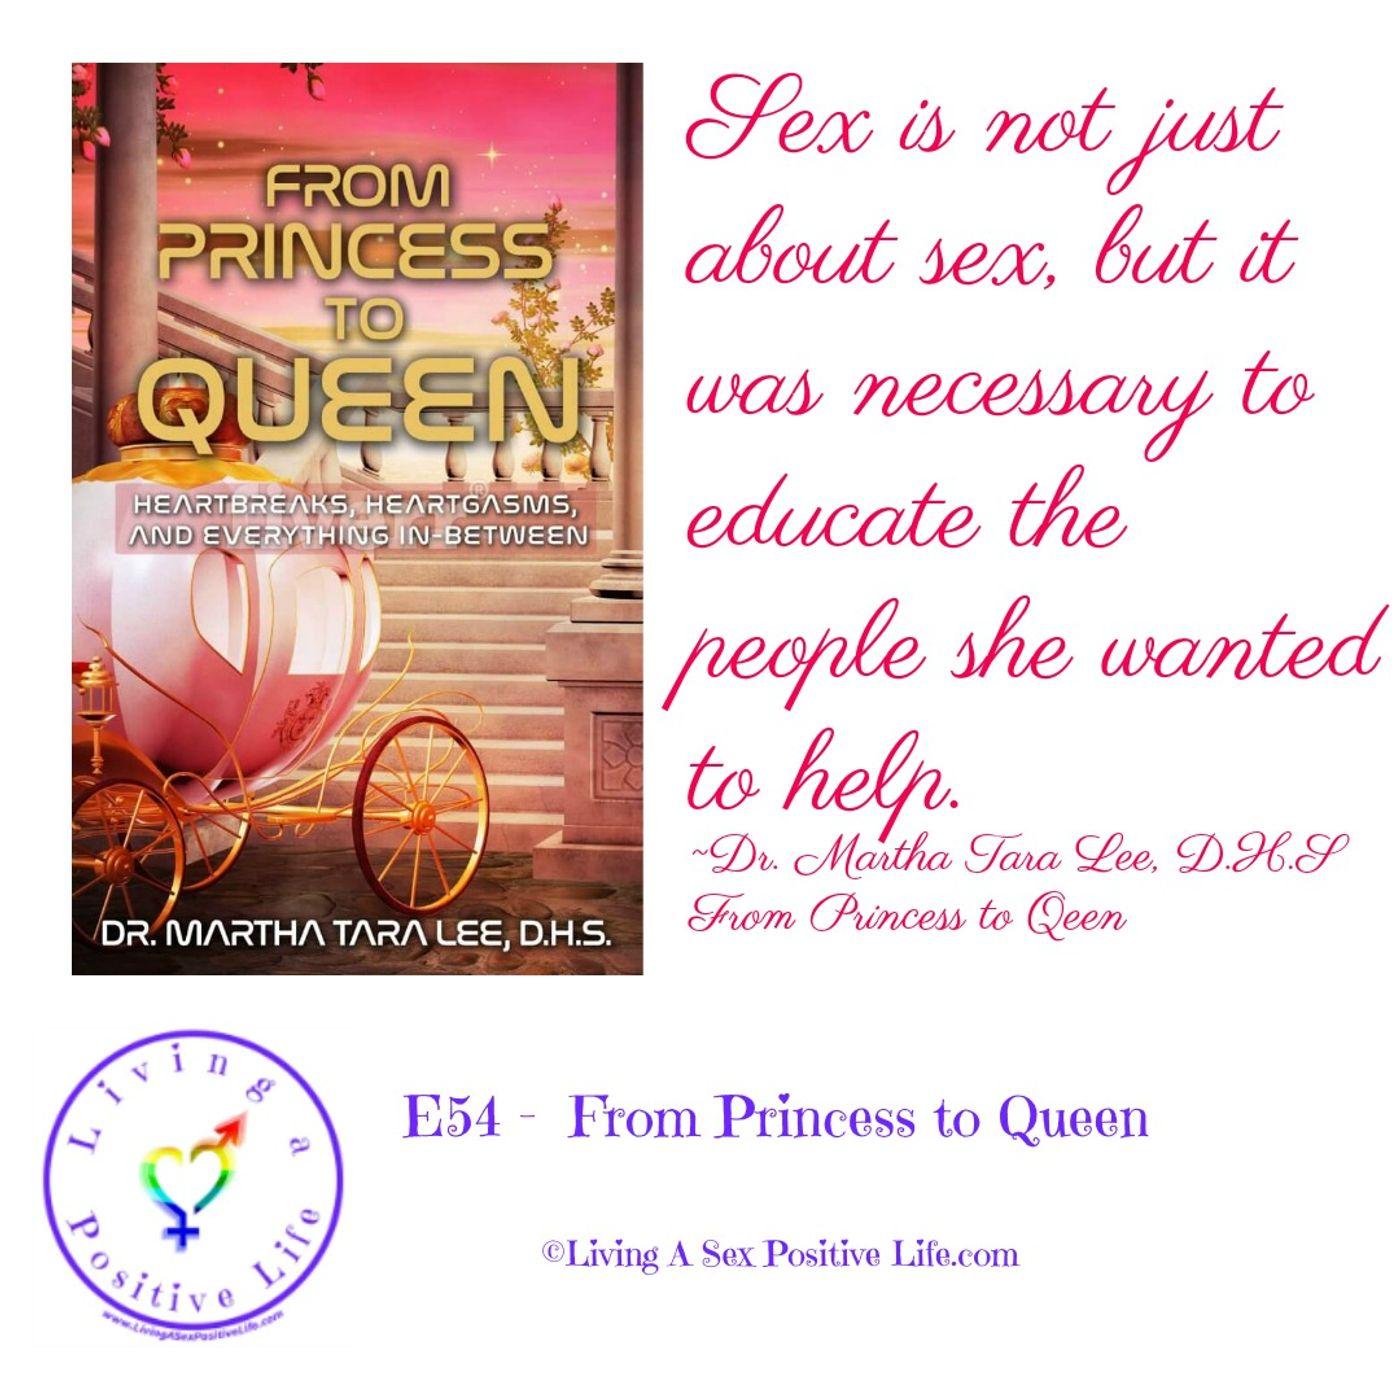 Sex Positive Me - E54 - From Princess to Queen